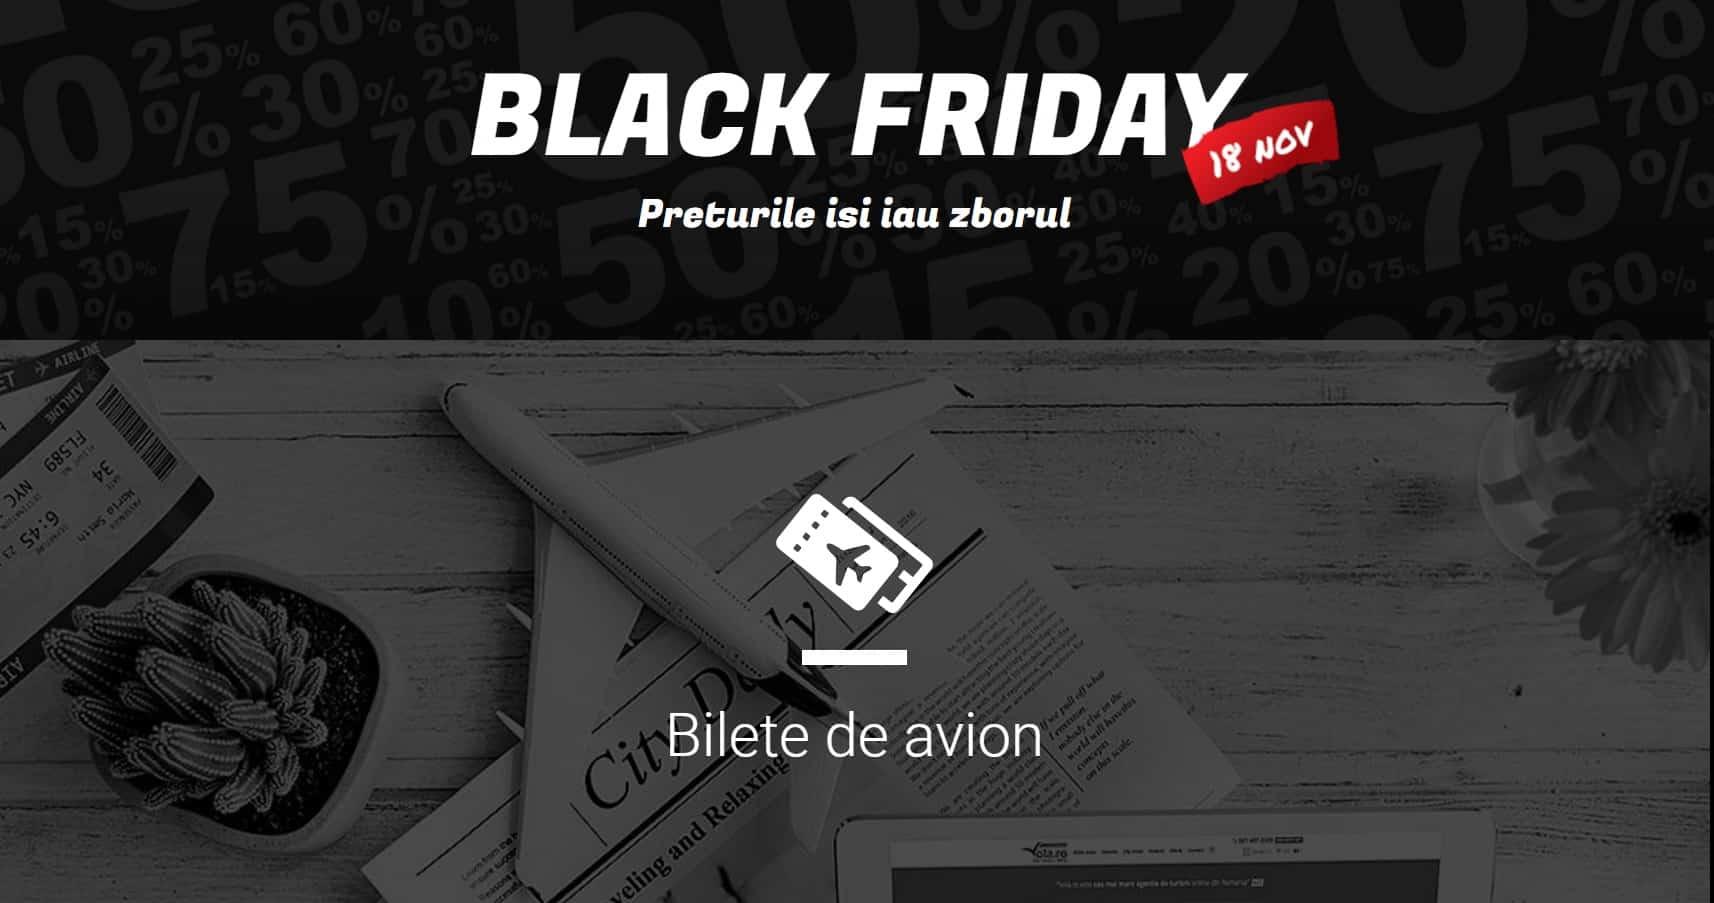 promotie-black-friday-2016-vola